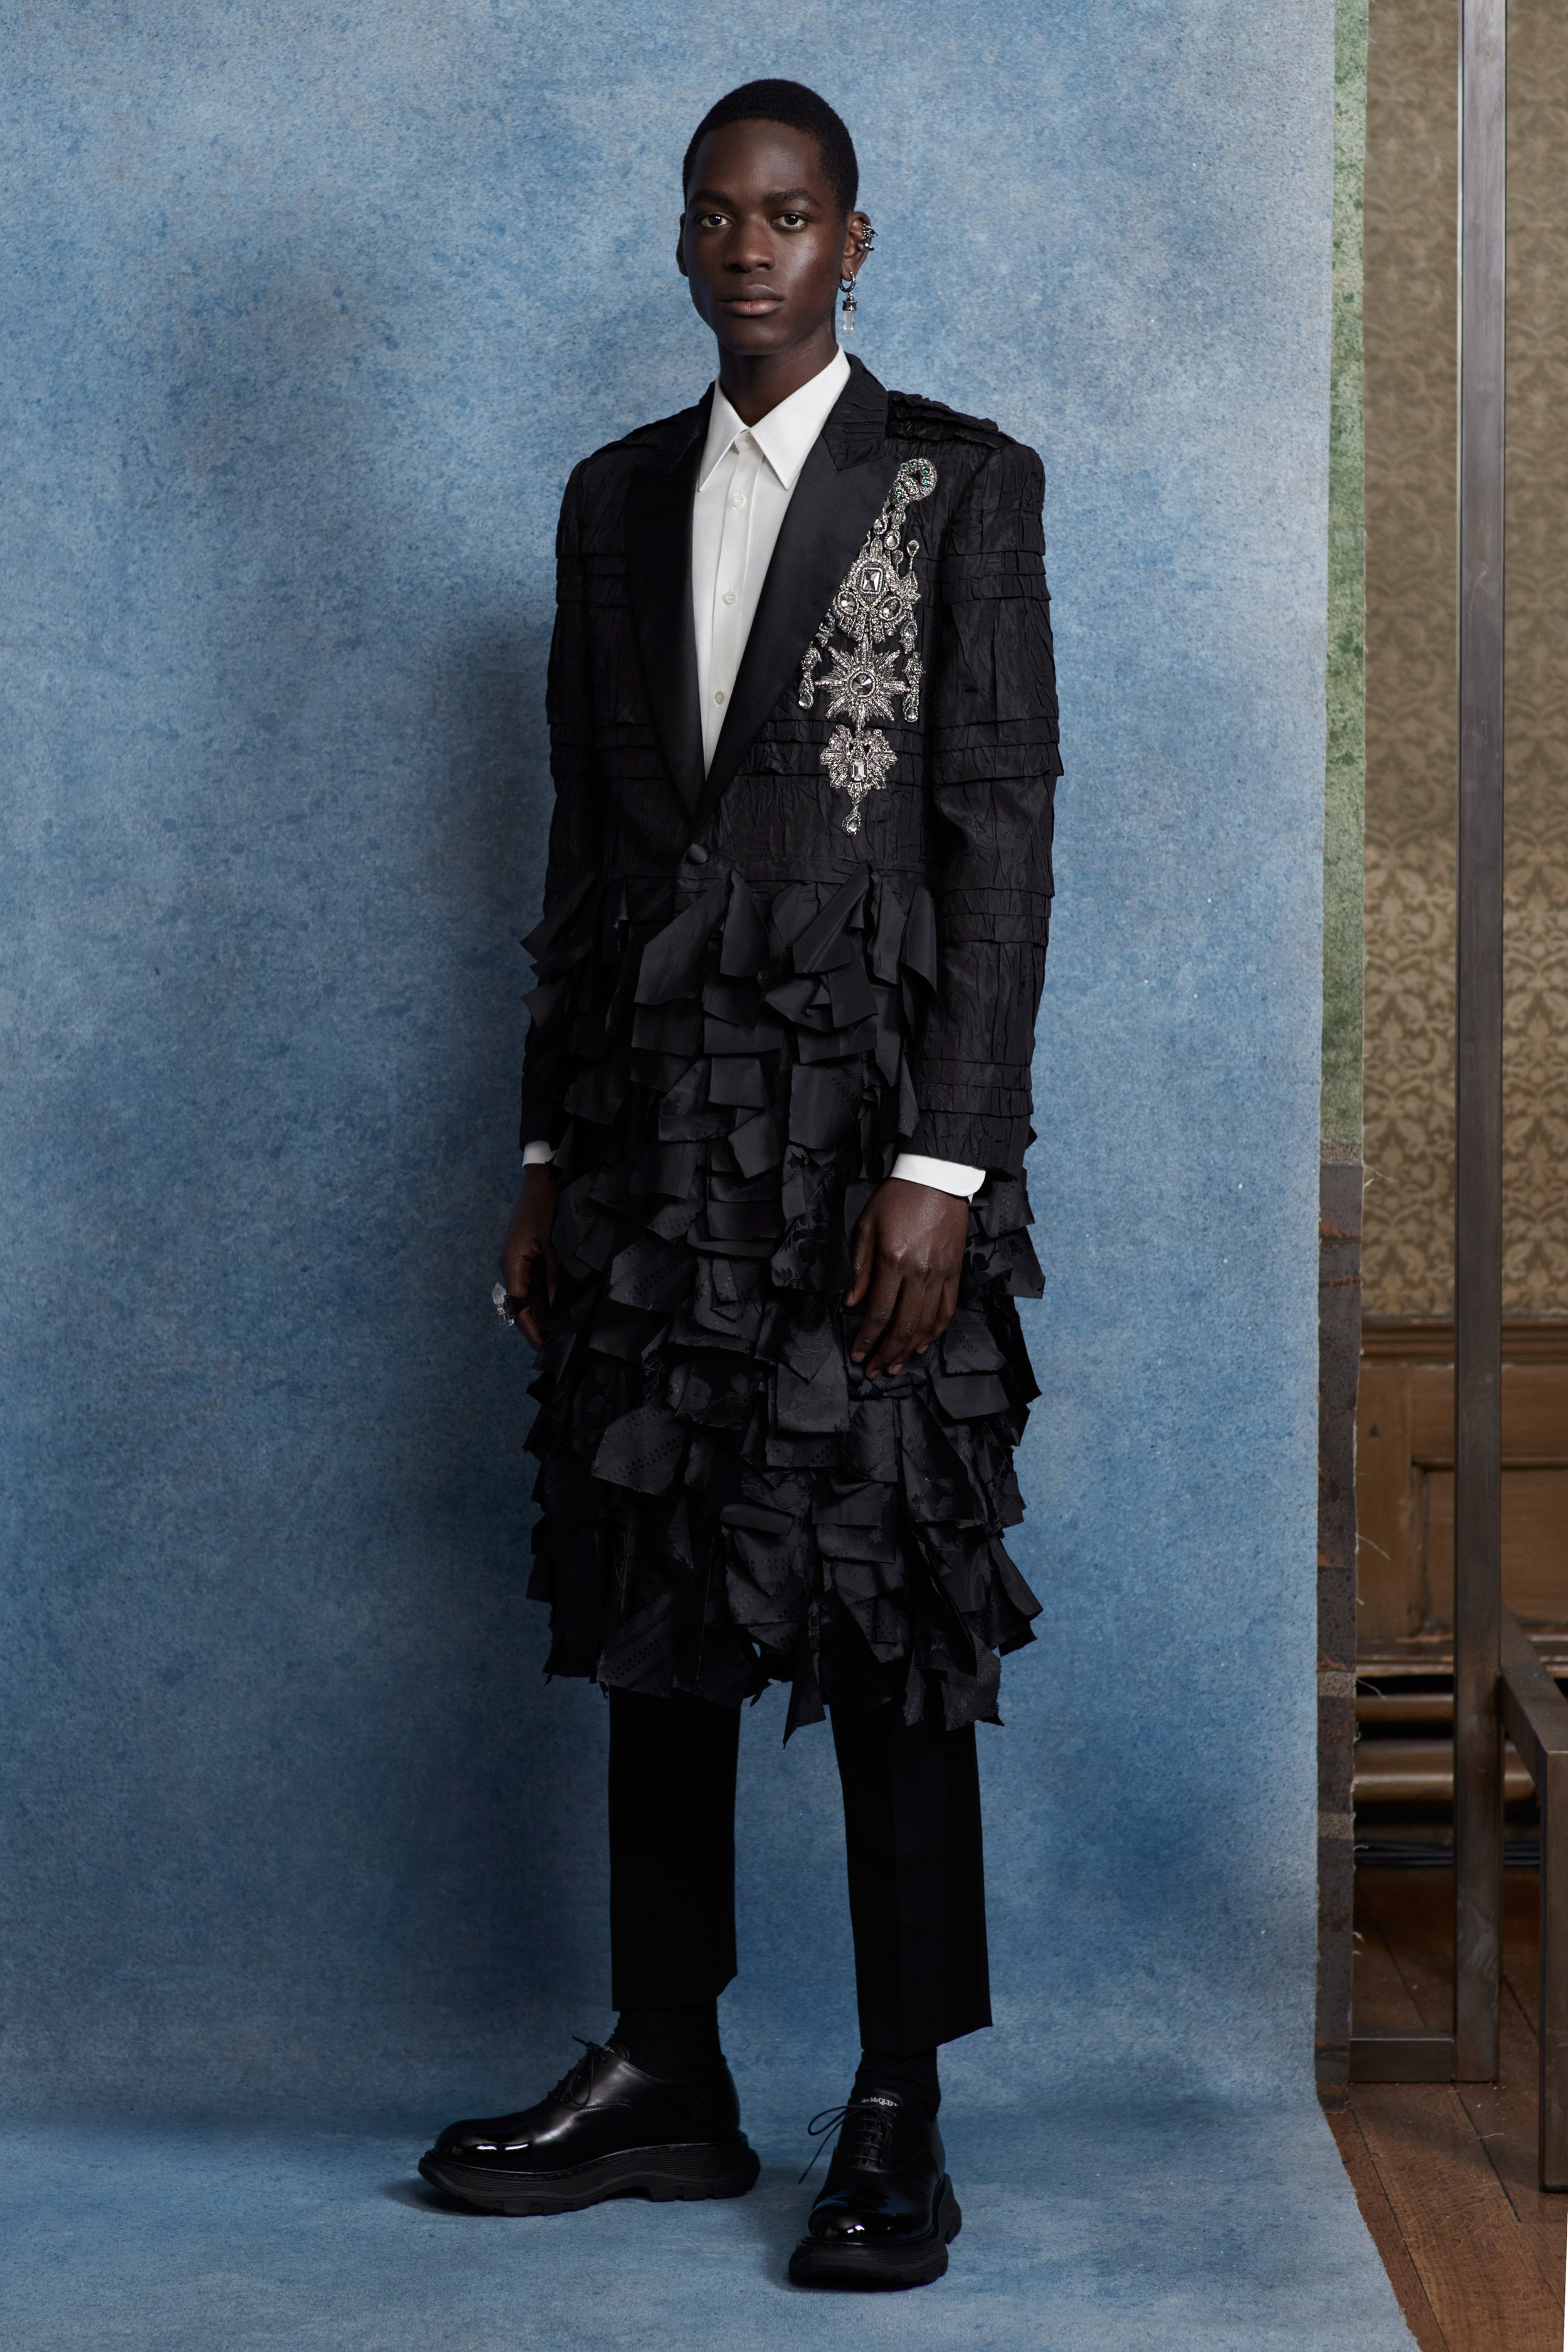 00008-alexander-mcqueen-menswear-spring-20-credit-Ethan-James-Green.jpg